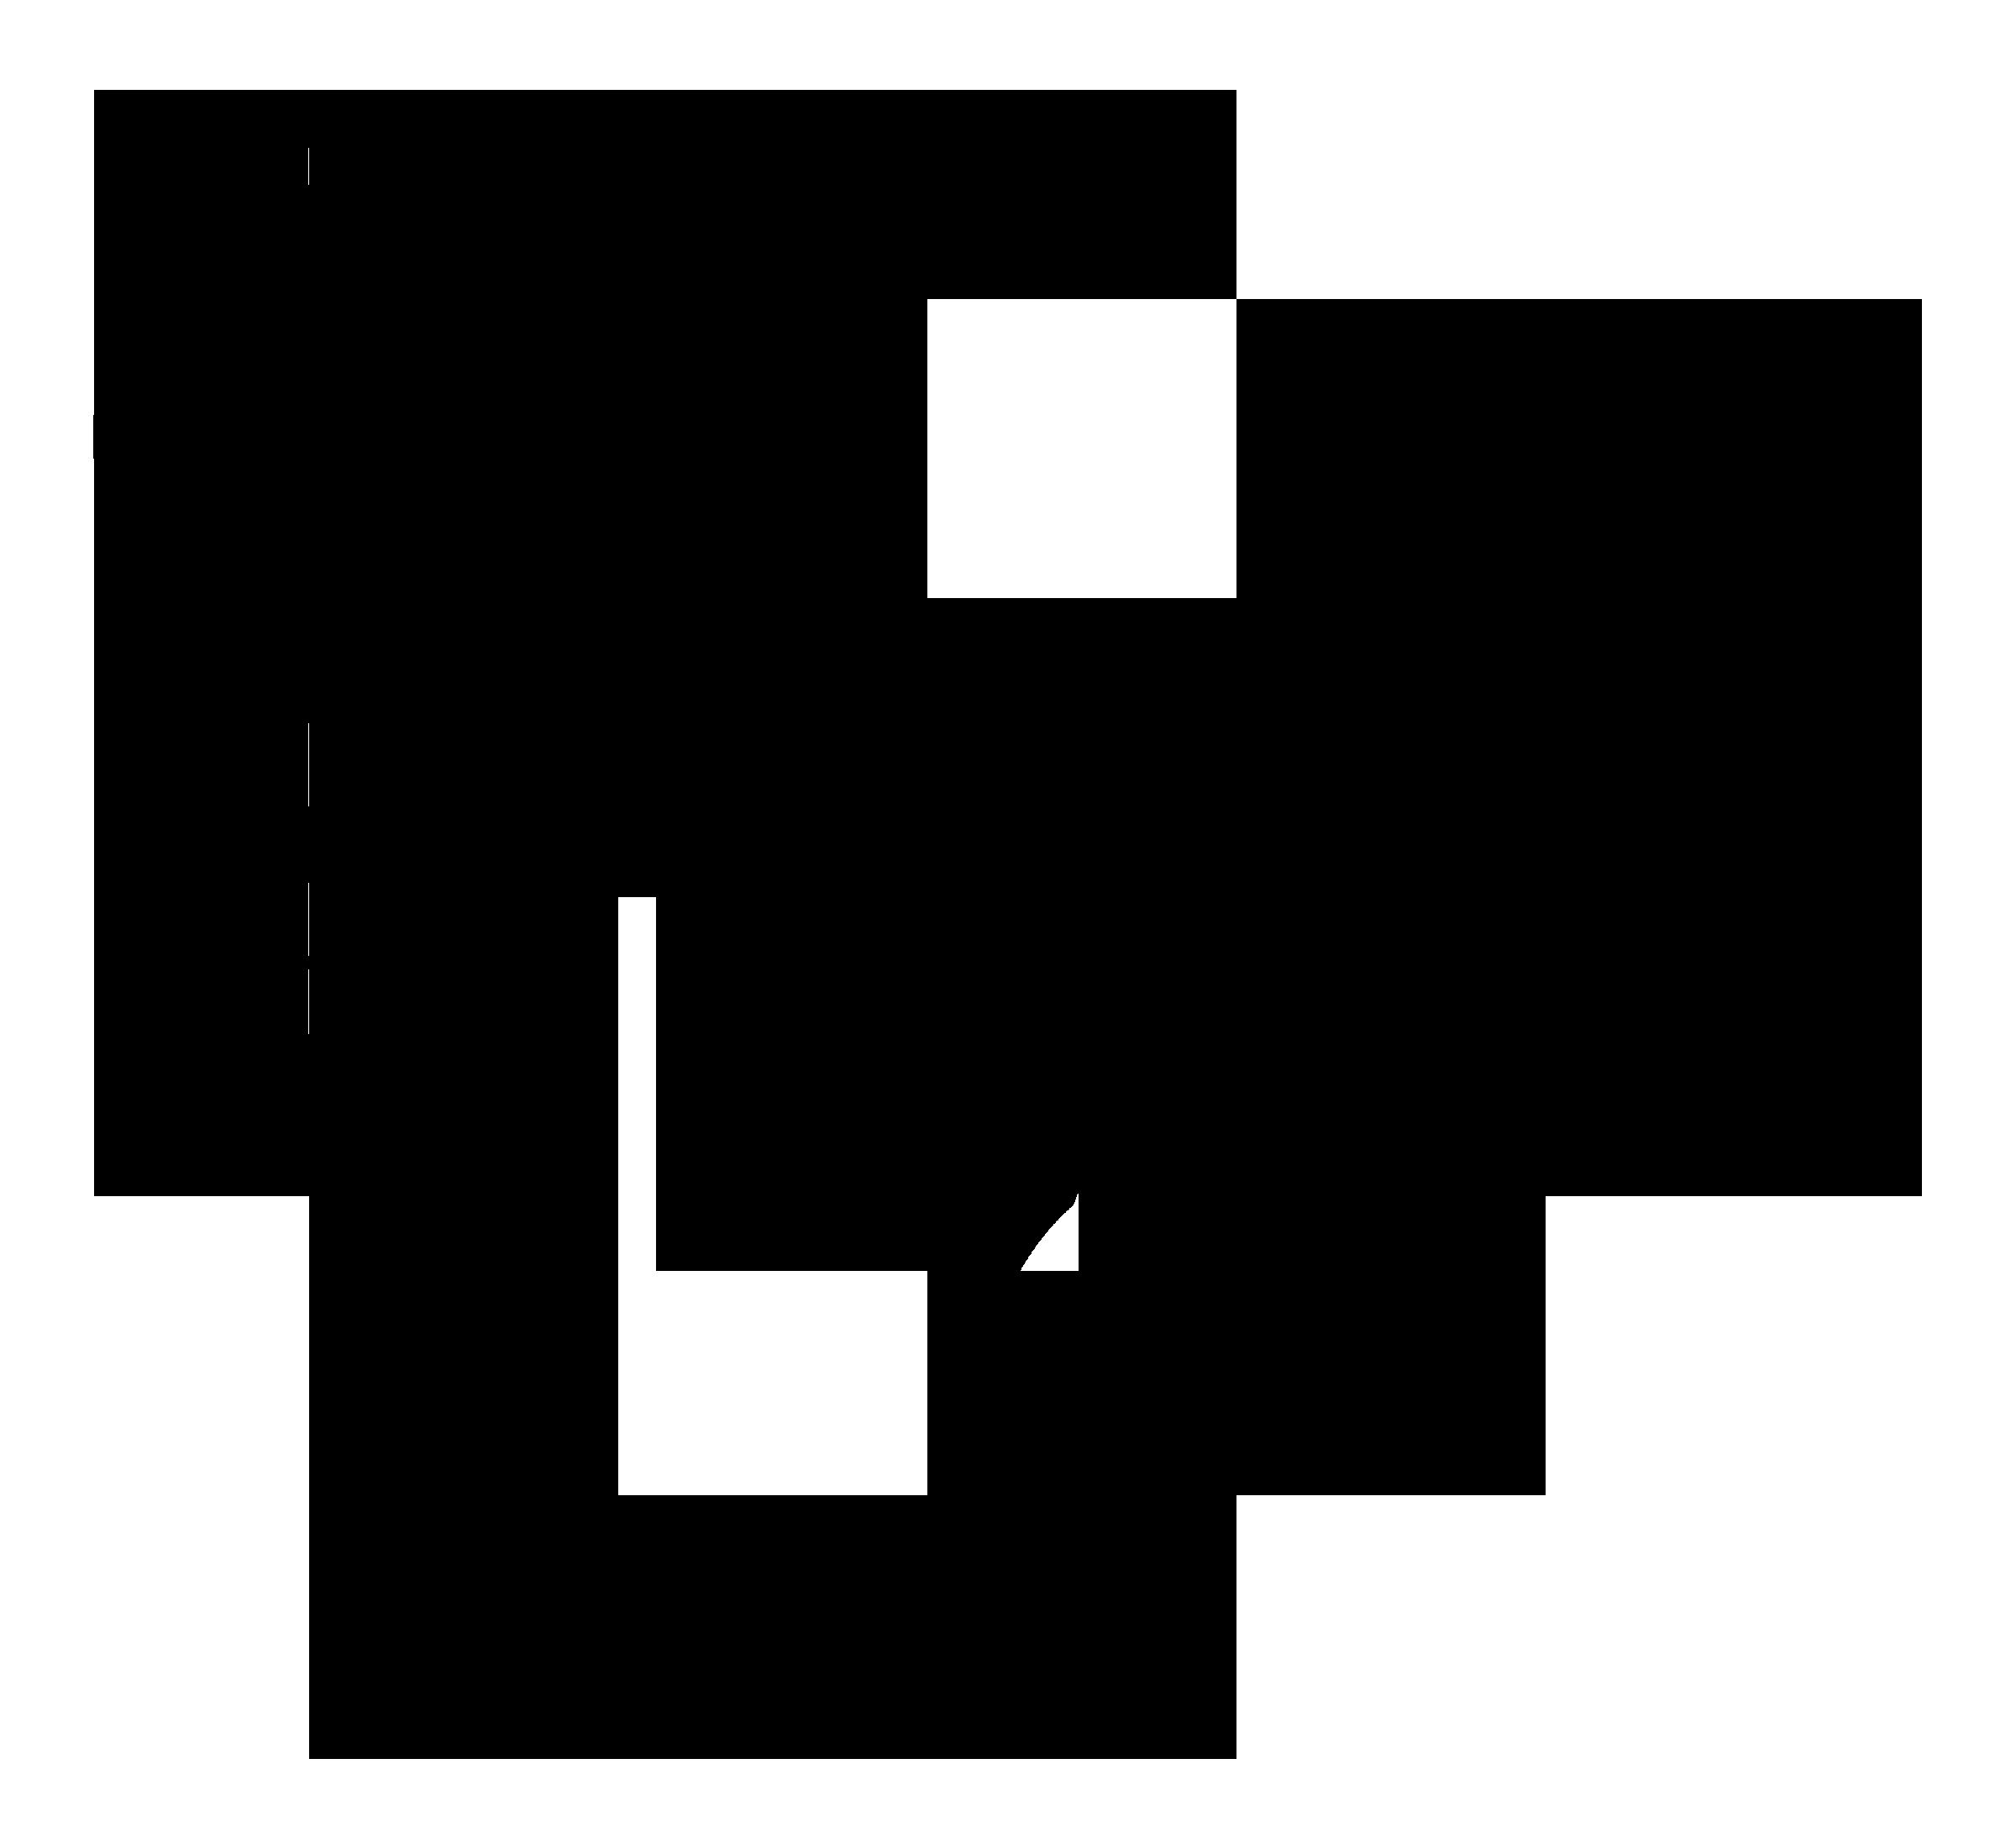 Houston texans coloring pages ~ Houston Texans Logo PNG Transparent & SVG Vector - Freebie ...